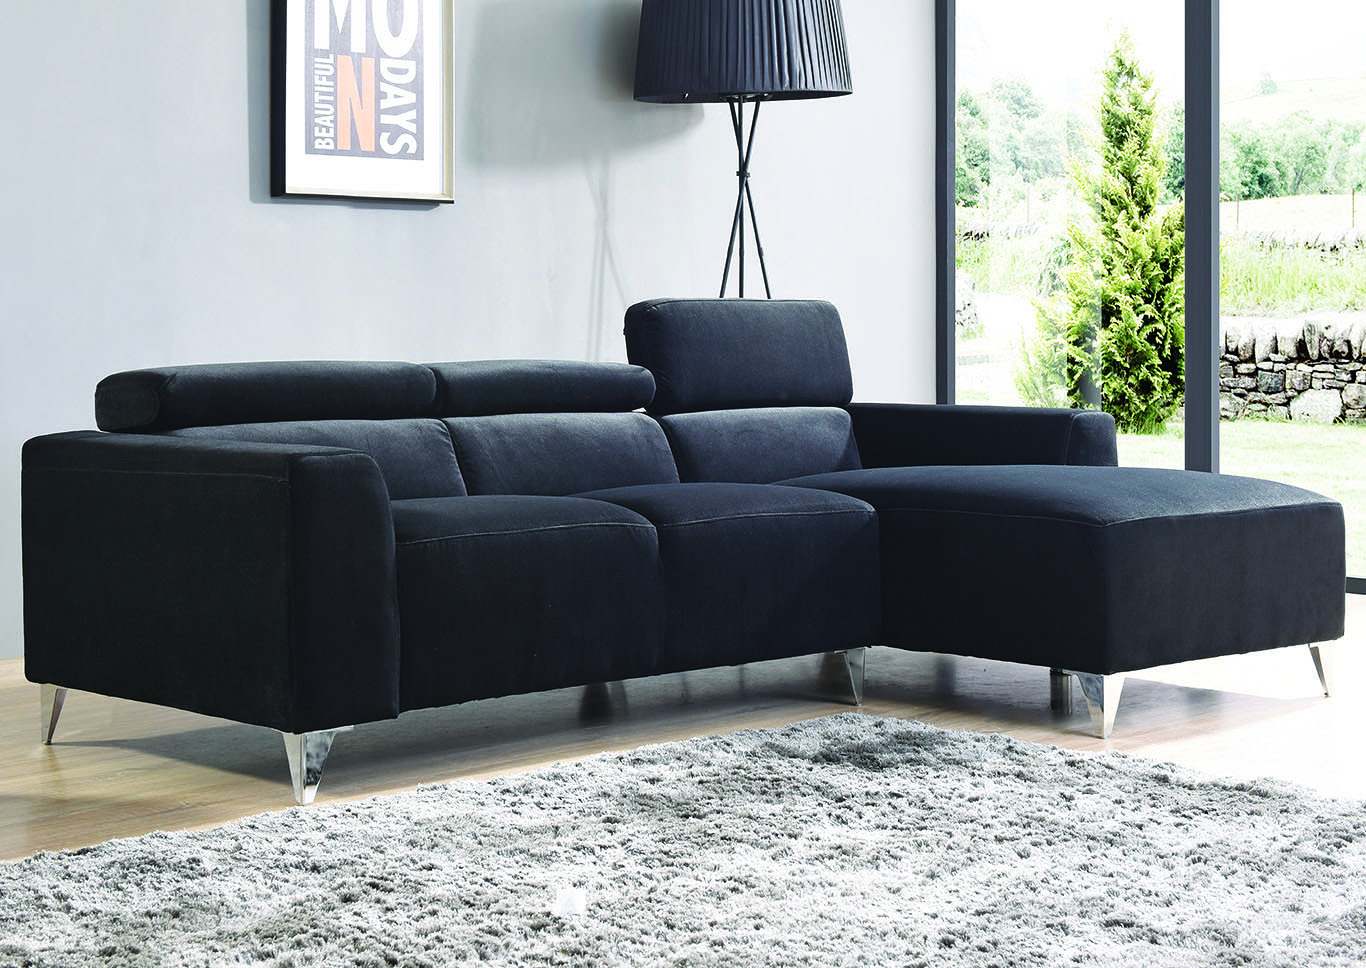 Furniture Direct NJ Black Velvet Micro Suede Sofa Sectional